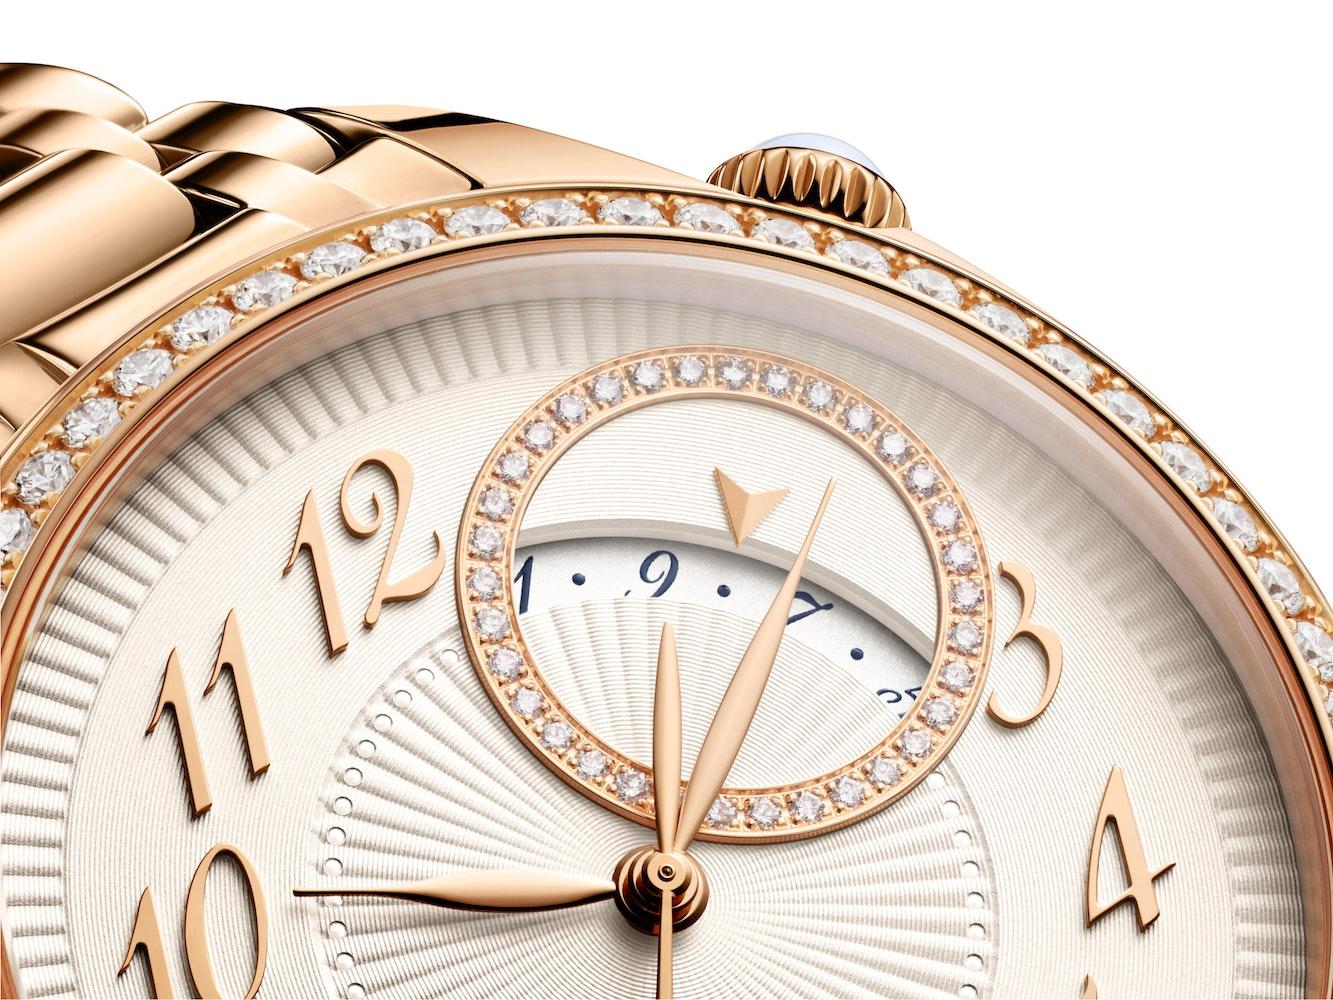 Vacheron Constantin Egerie Self Winding Pink Gold with Diamond Set Case Date Indication 2